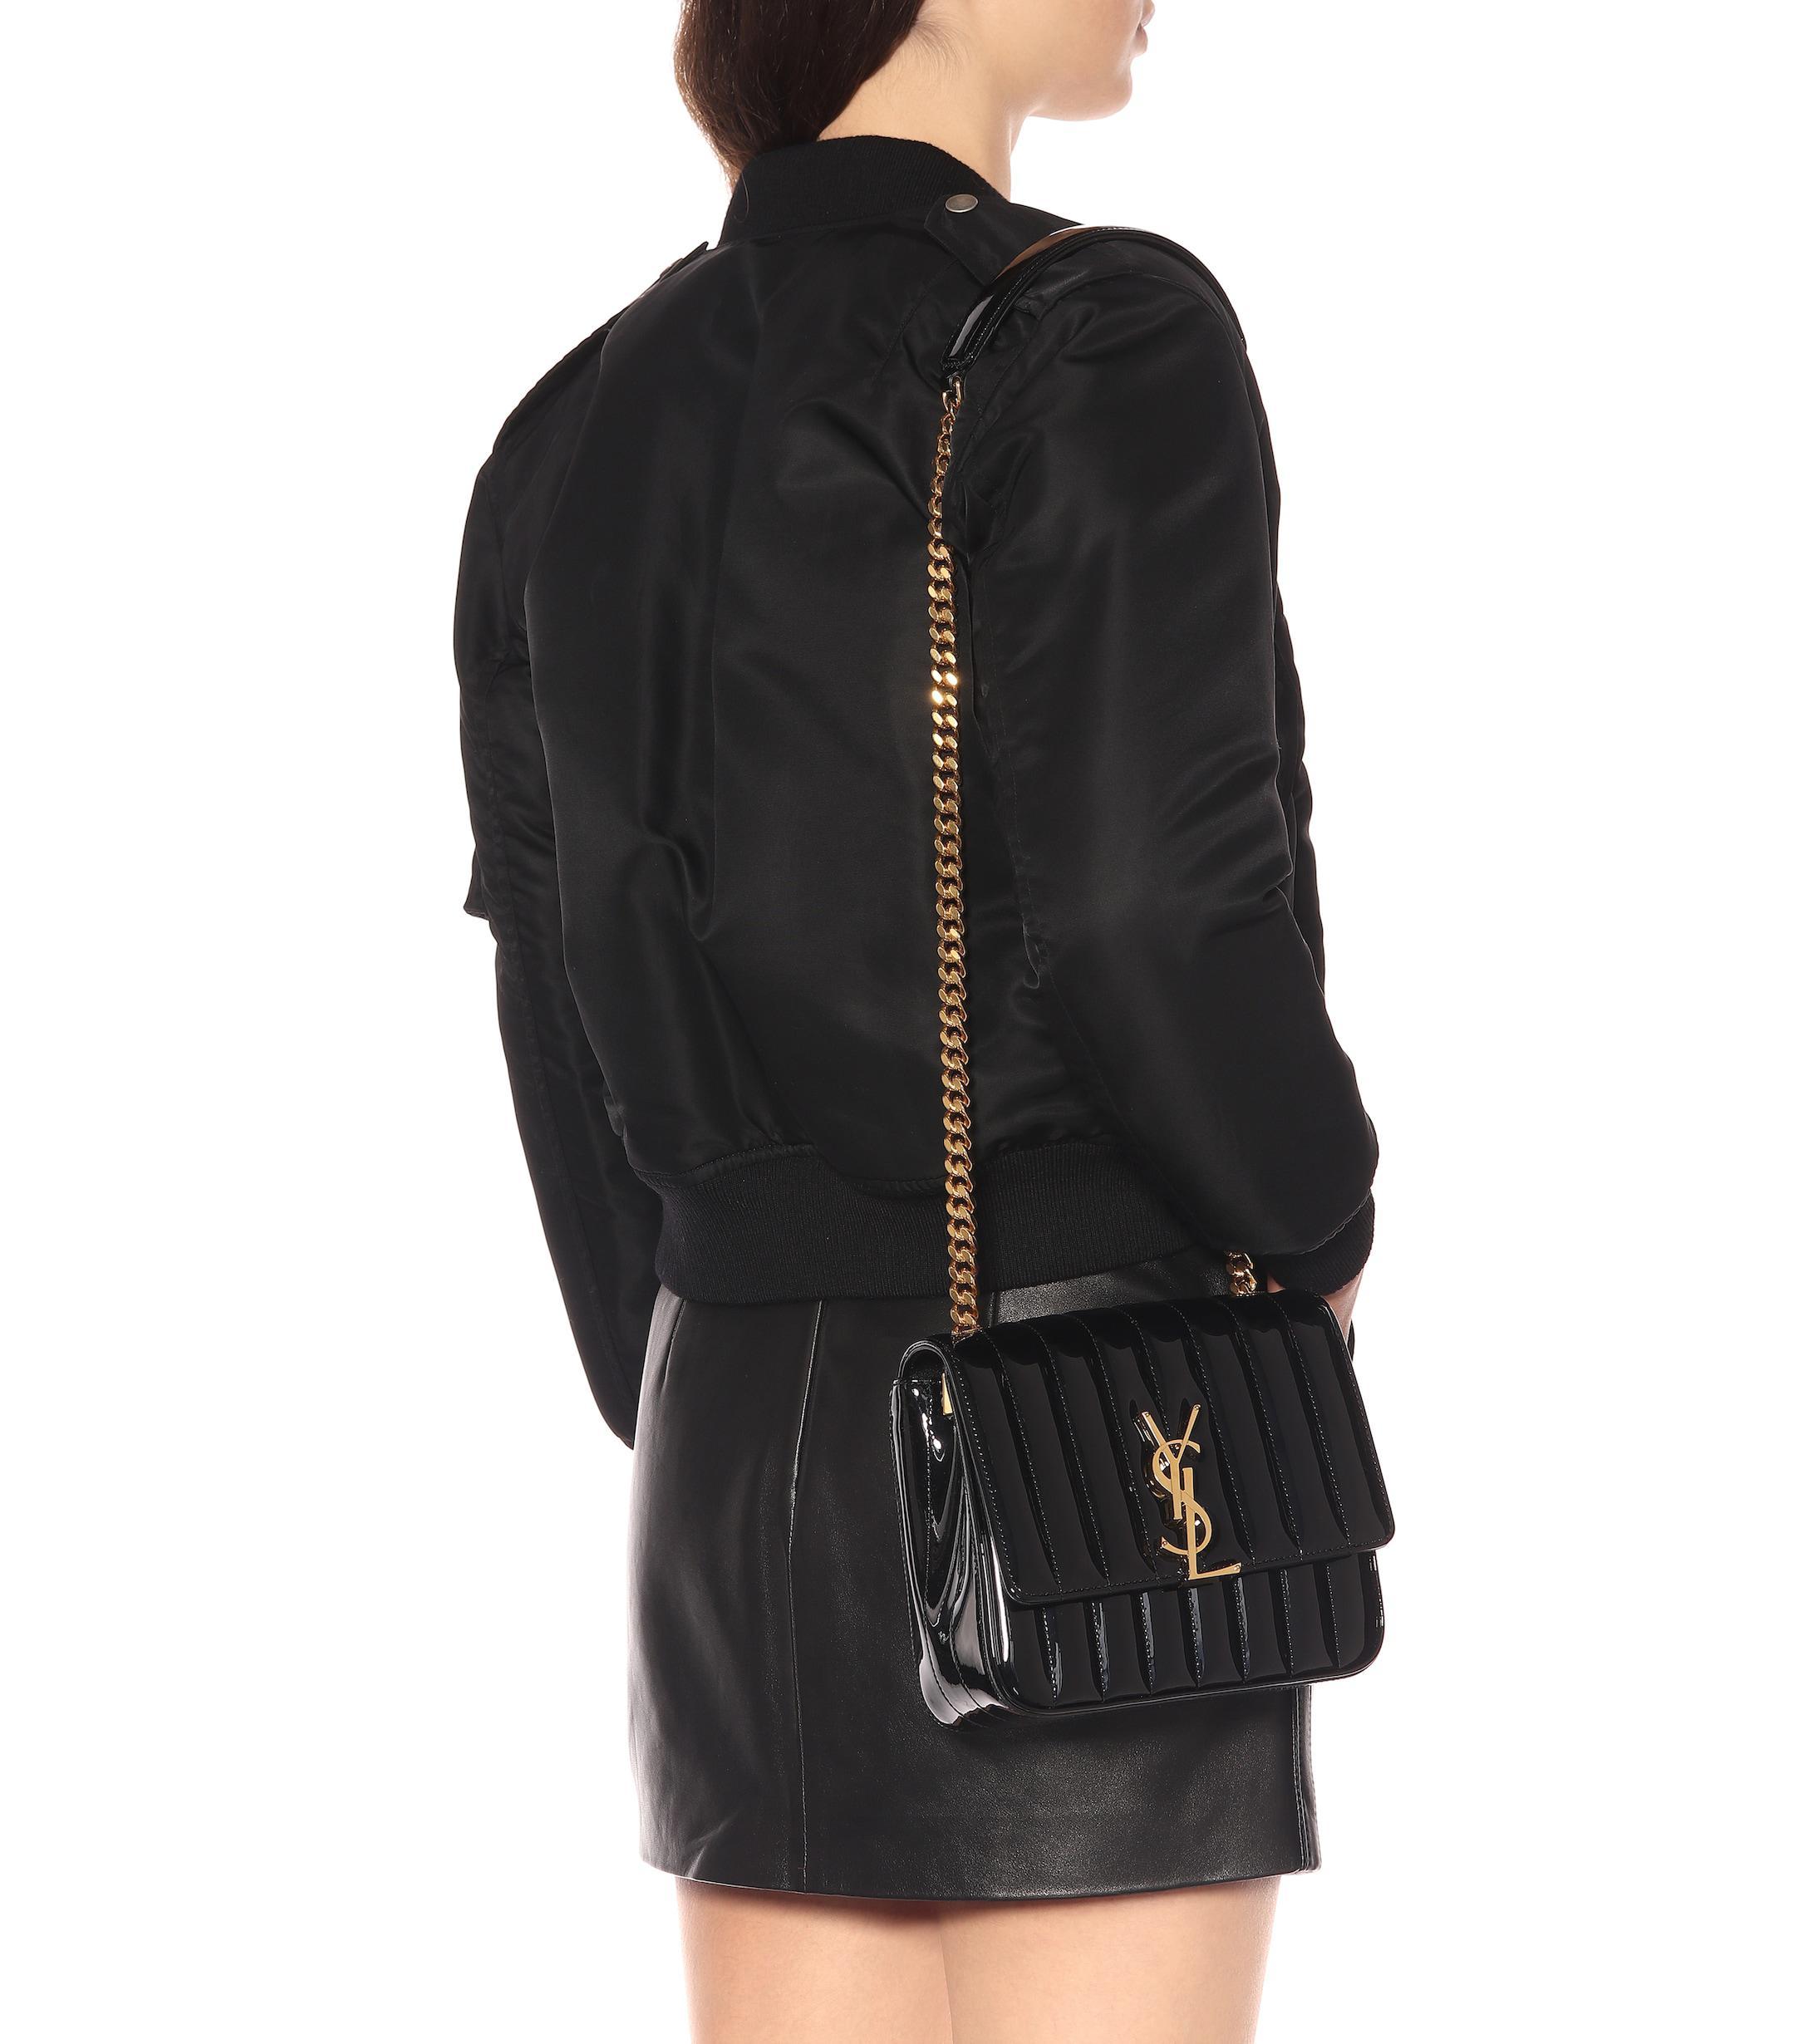 a88f9b11455 Saint Laurent - Black Small Vicky Leather Crossbody Bag - Lyst. View  fullscreen